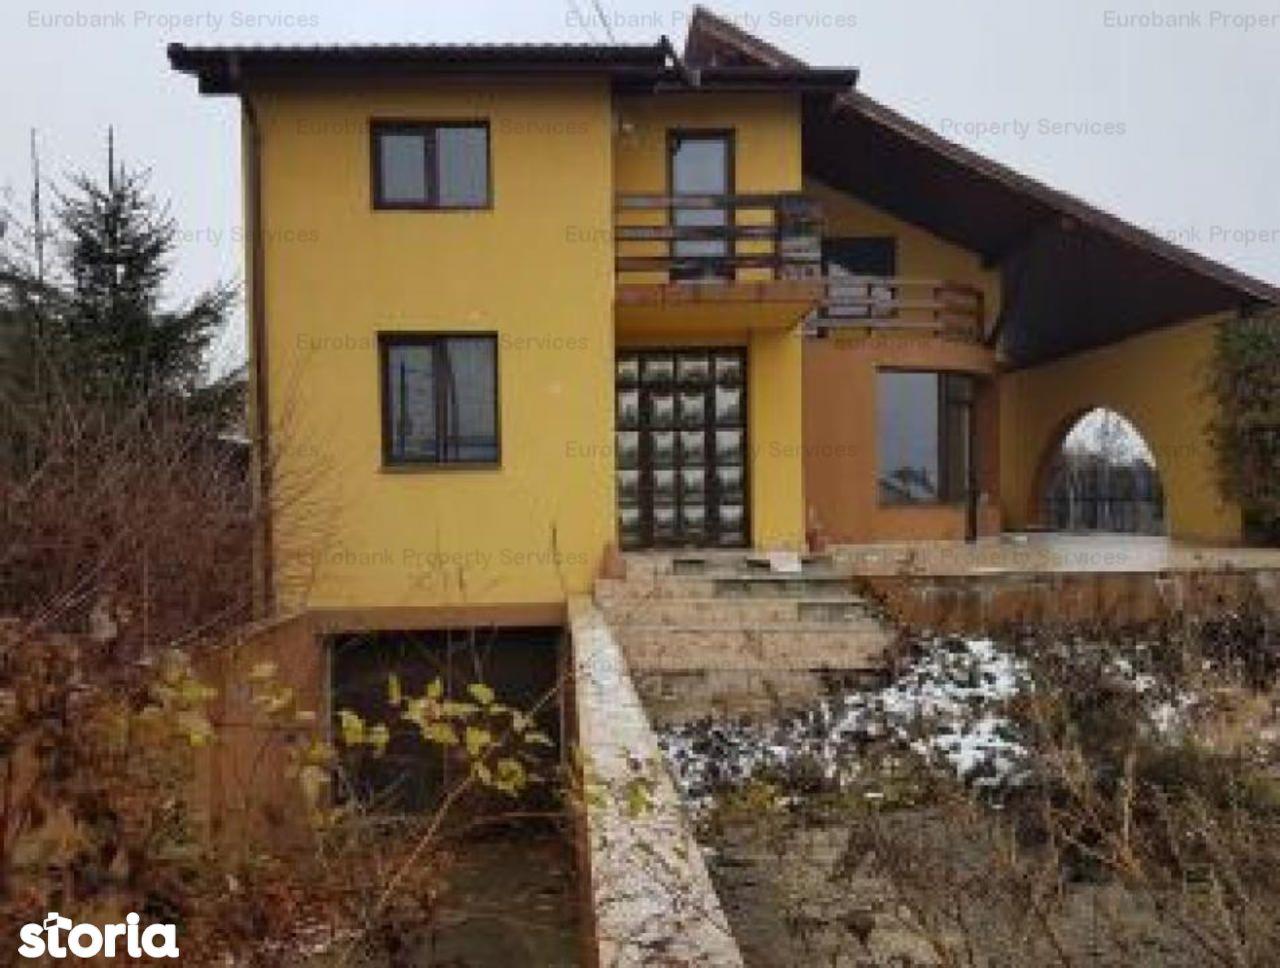 Casa de vanzare, Neamț (judet), Strada Călugărului - Foto 3